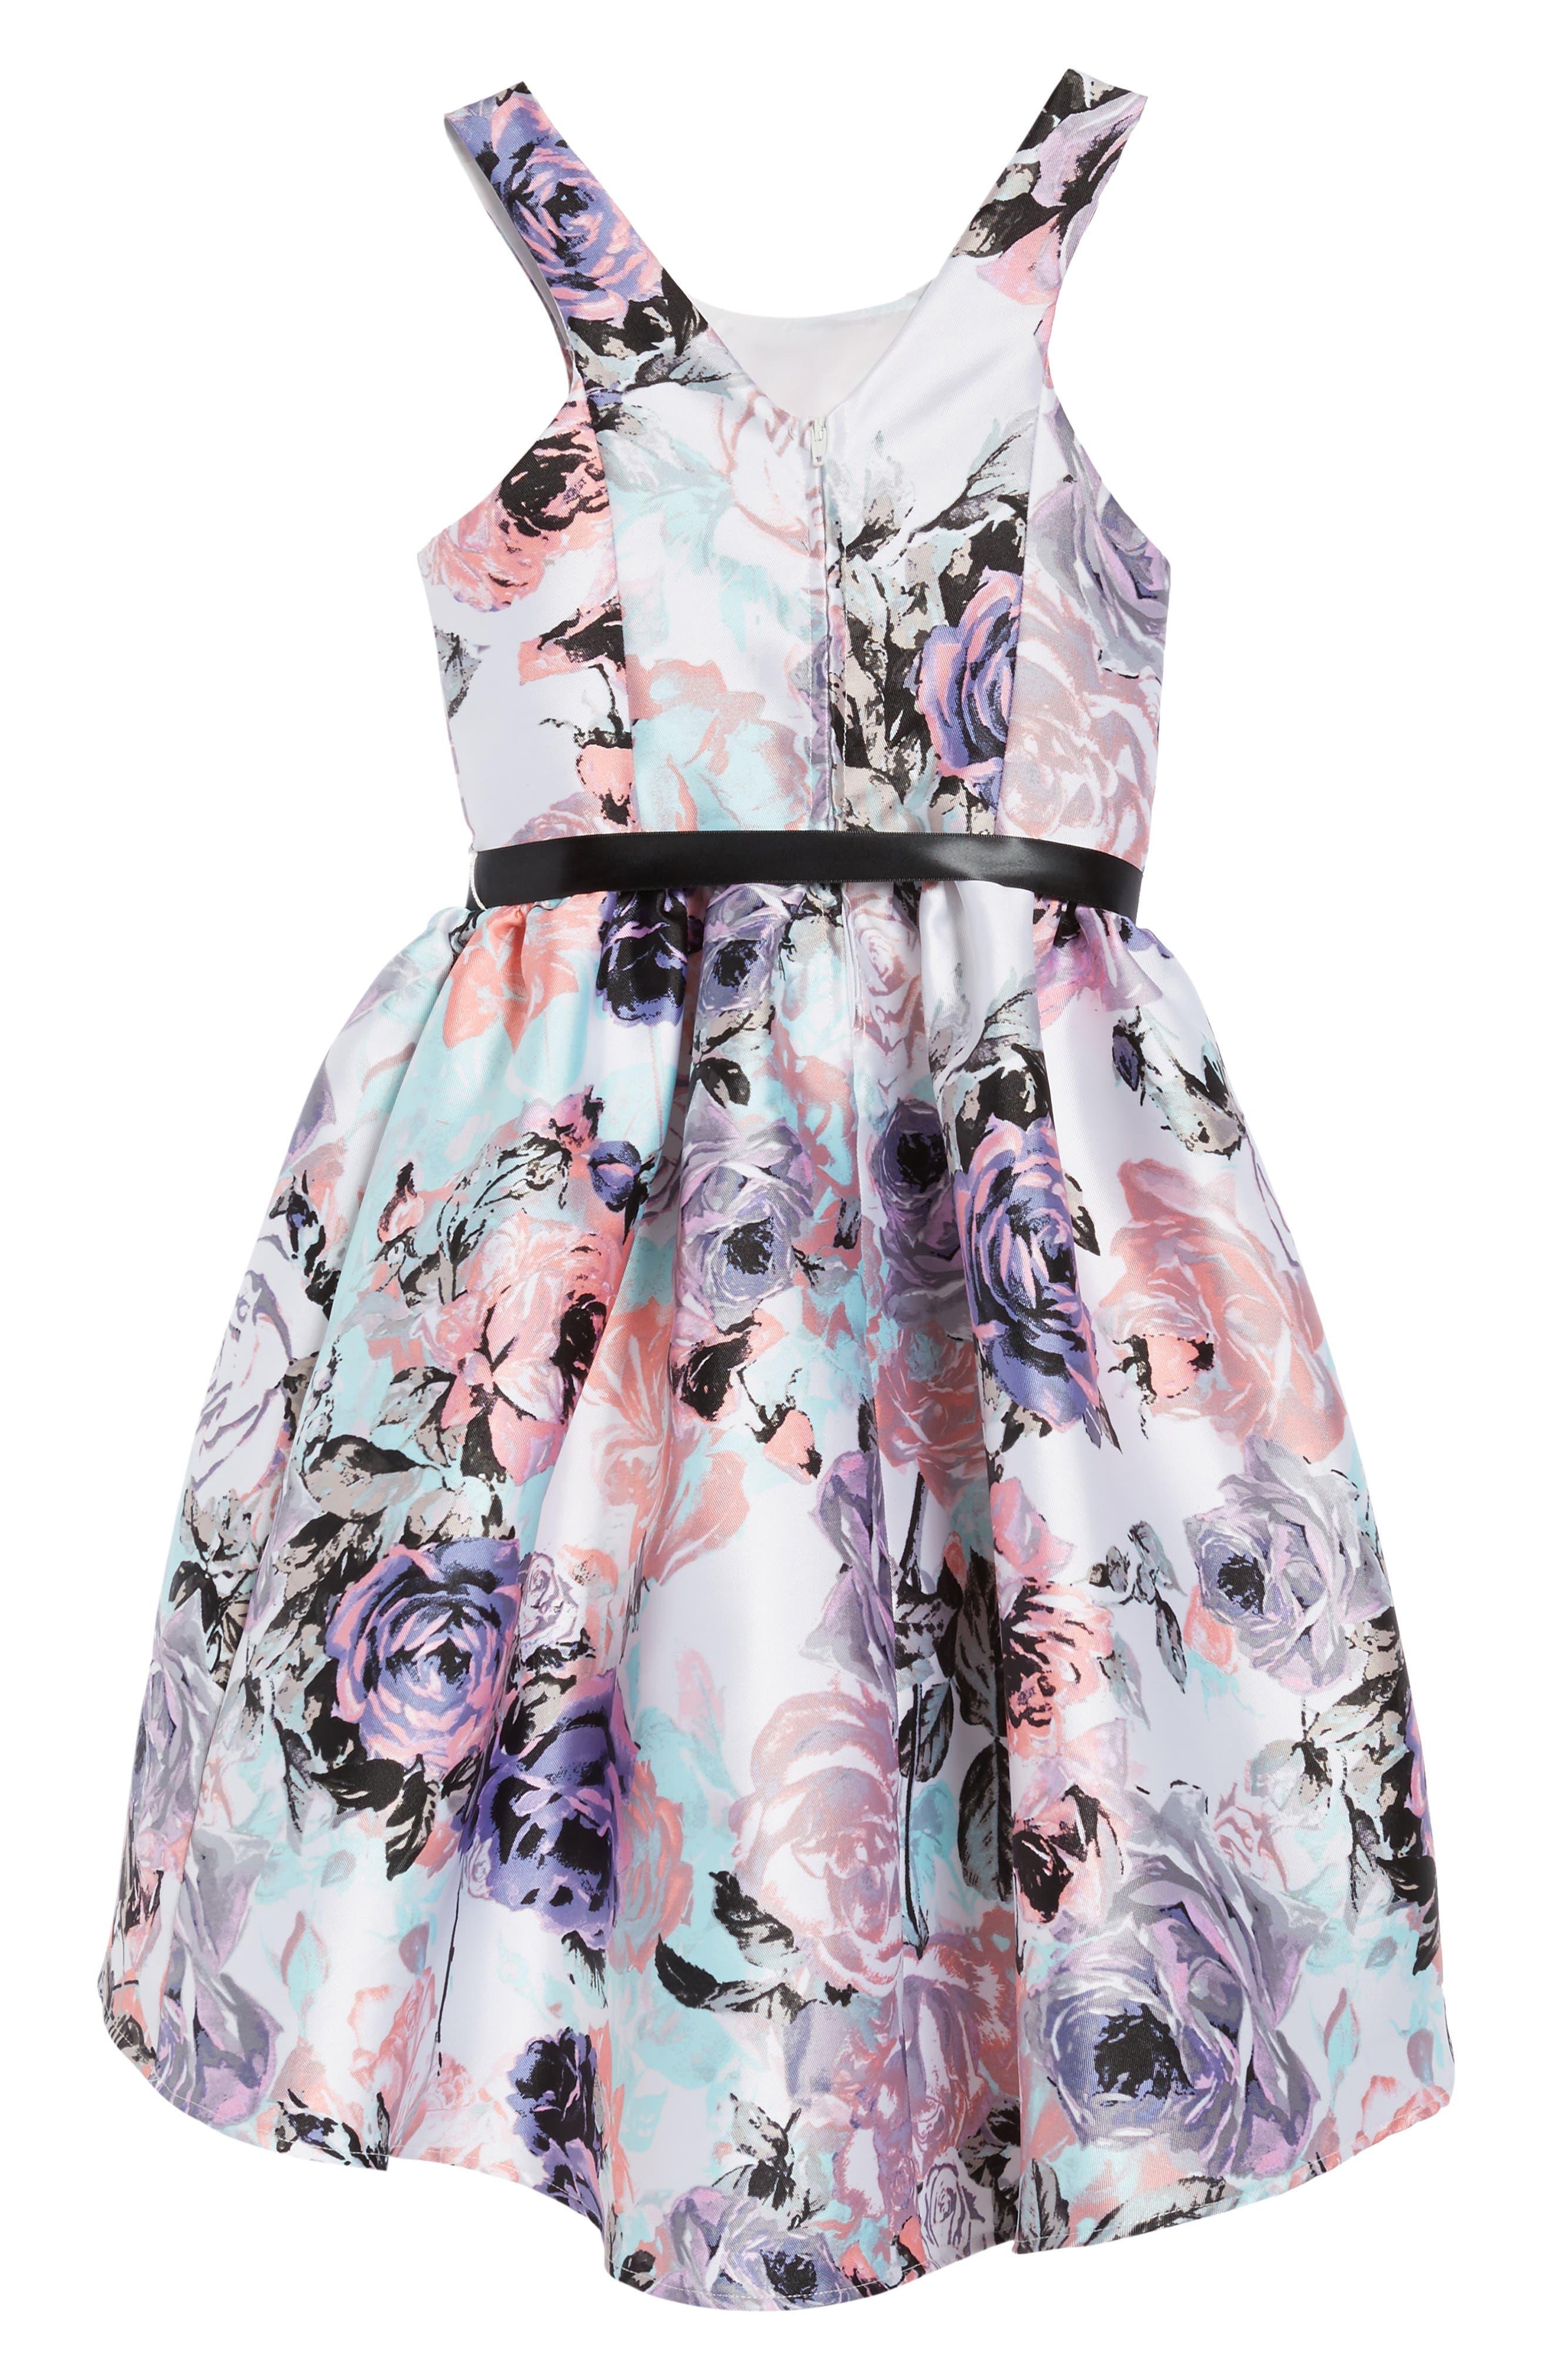 Floral Print Party Dress,                             Alternate thumbnail 3, color,                             Lilac/ Blush